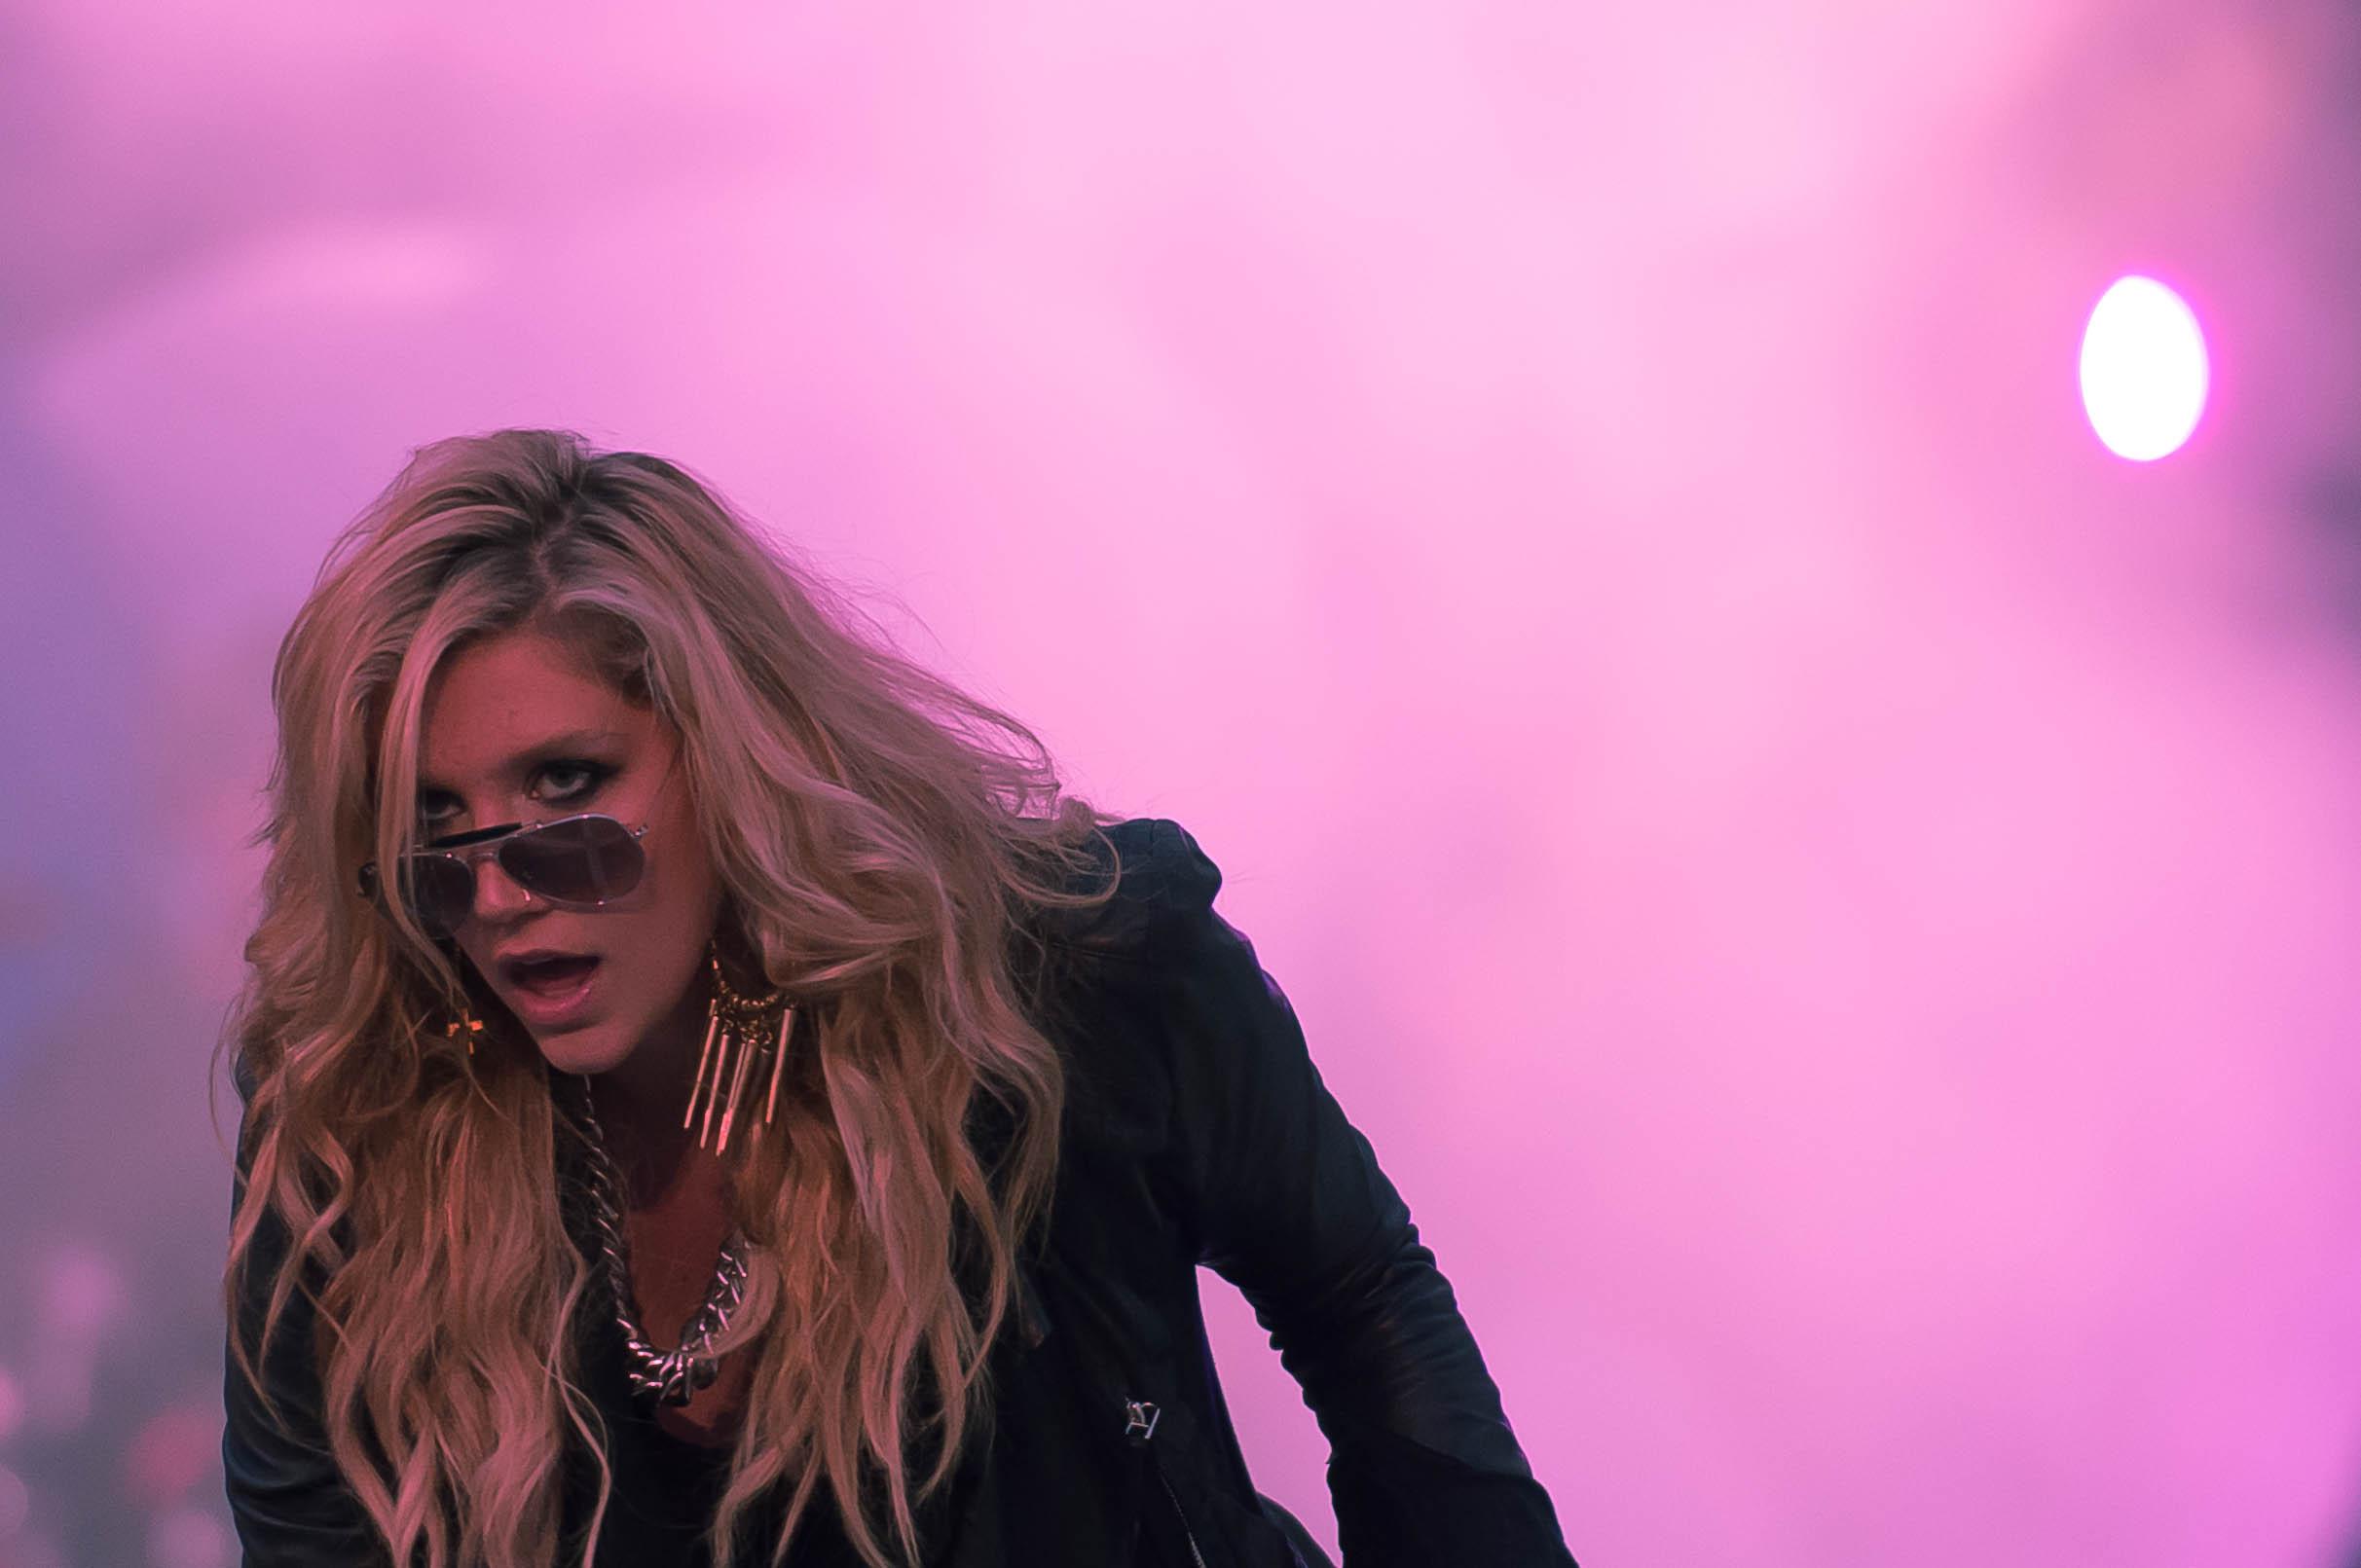 Kesha 與 Dr. Luke 的官司纏鬥,何時有解?